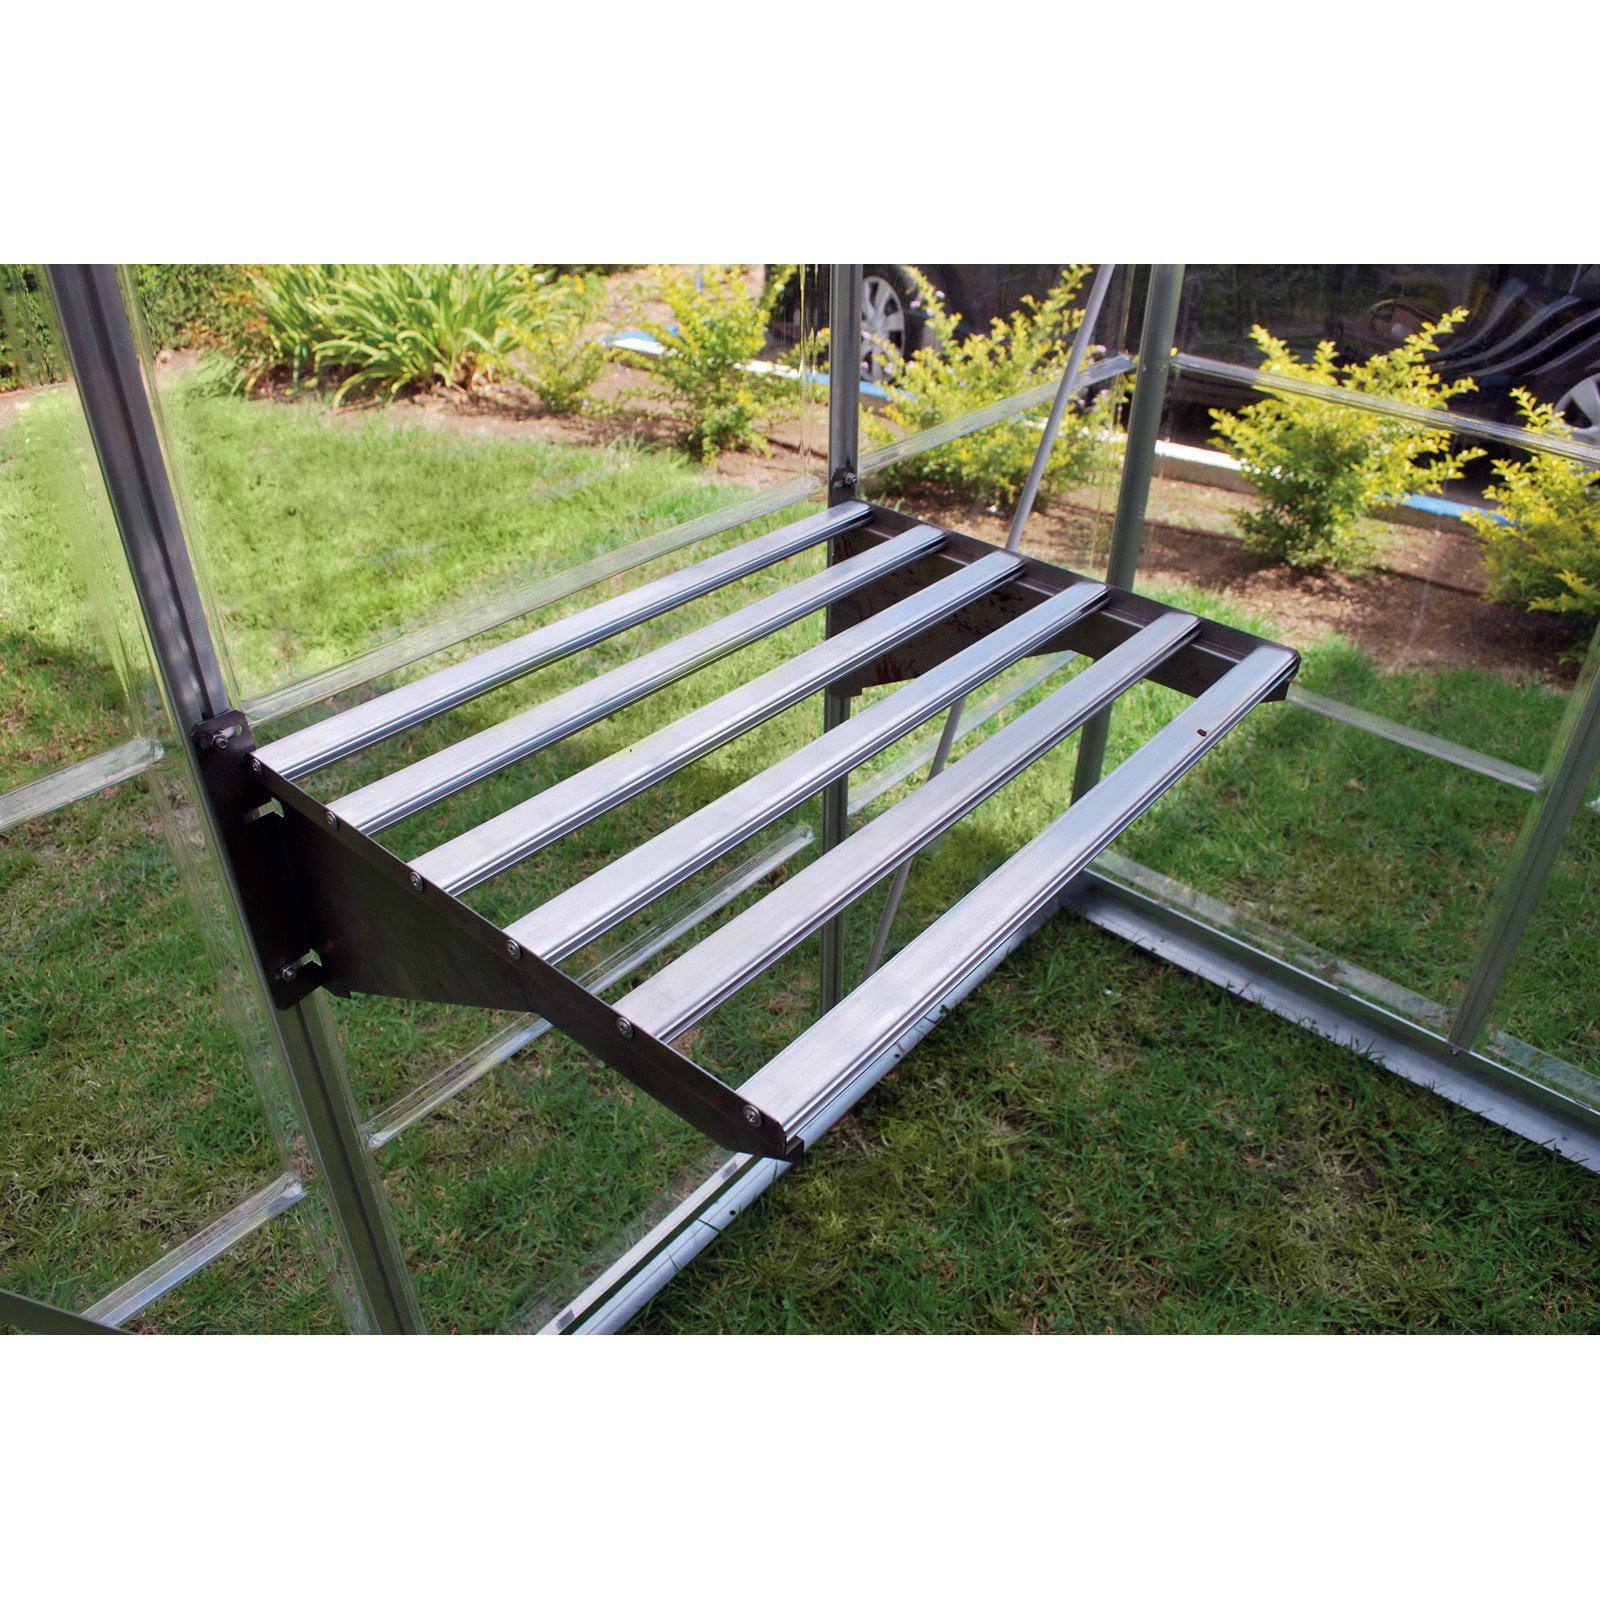 Palram Heavy Duty Greenhouse Shelf